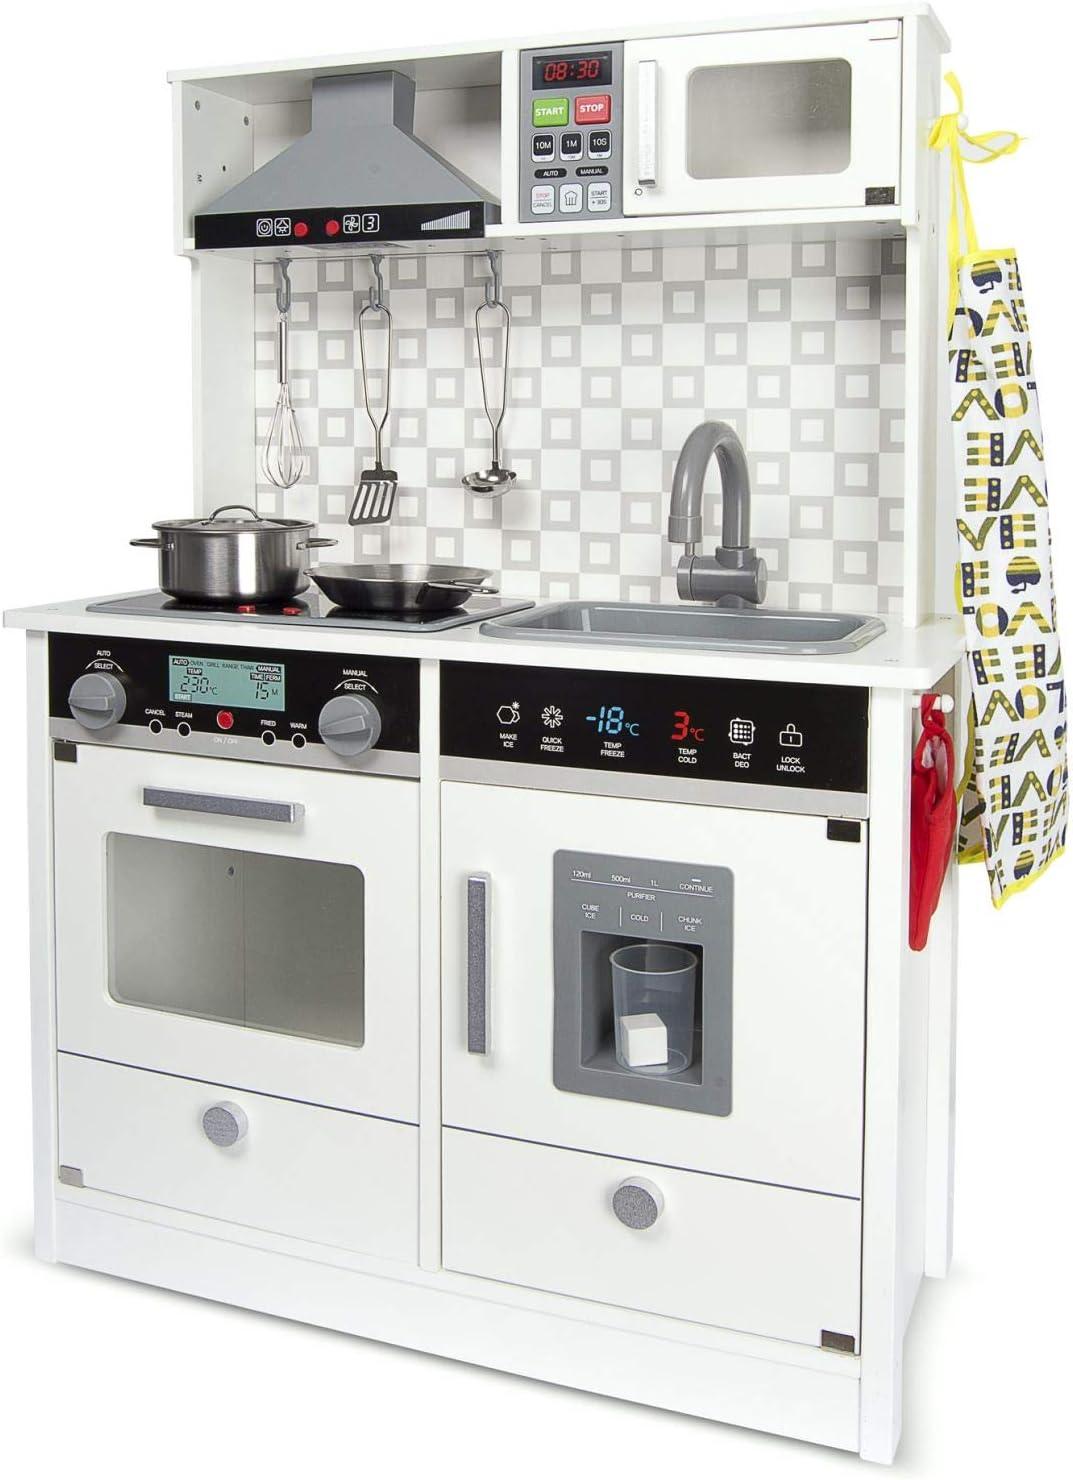 Leomark White Modern Cocina eléctrica Madera Infantil con Accesorios: Campana Extractora, microondas - Color BLANCO - Juguete para Niños Efectos de Sonido de iluminación Dim: 65x30x94 (altura)cm